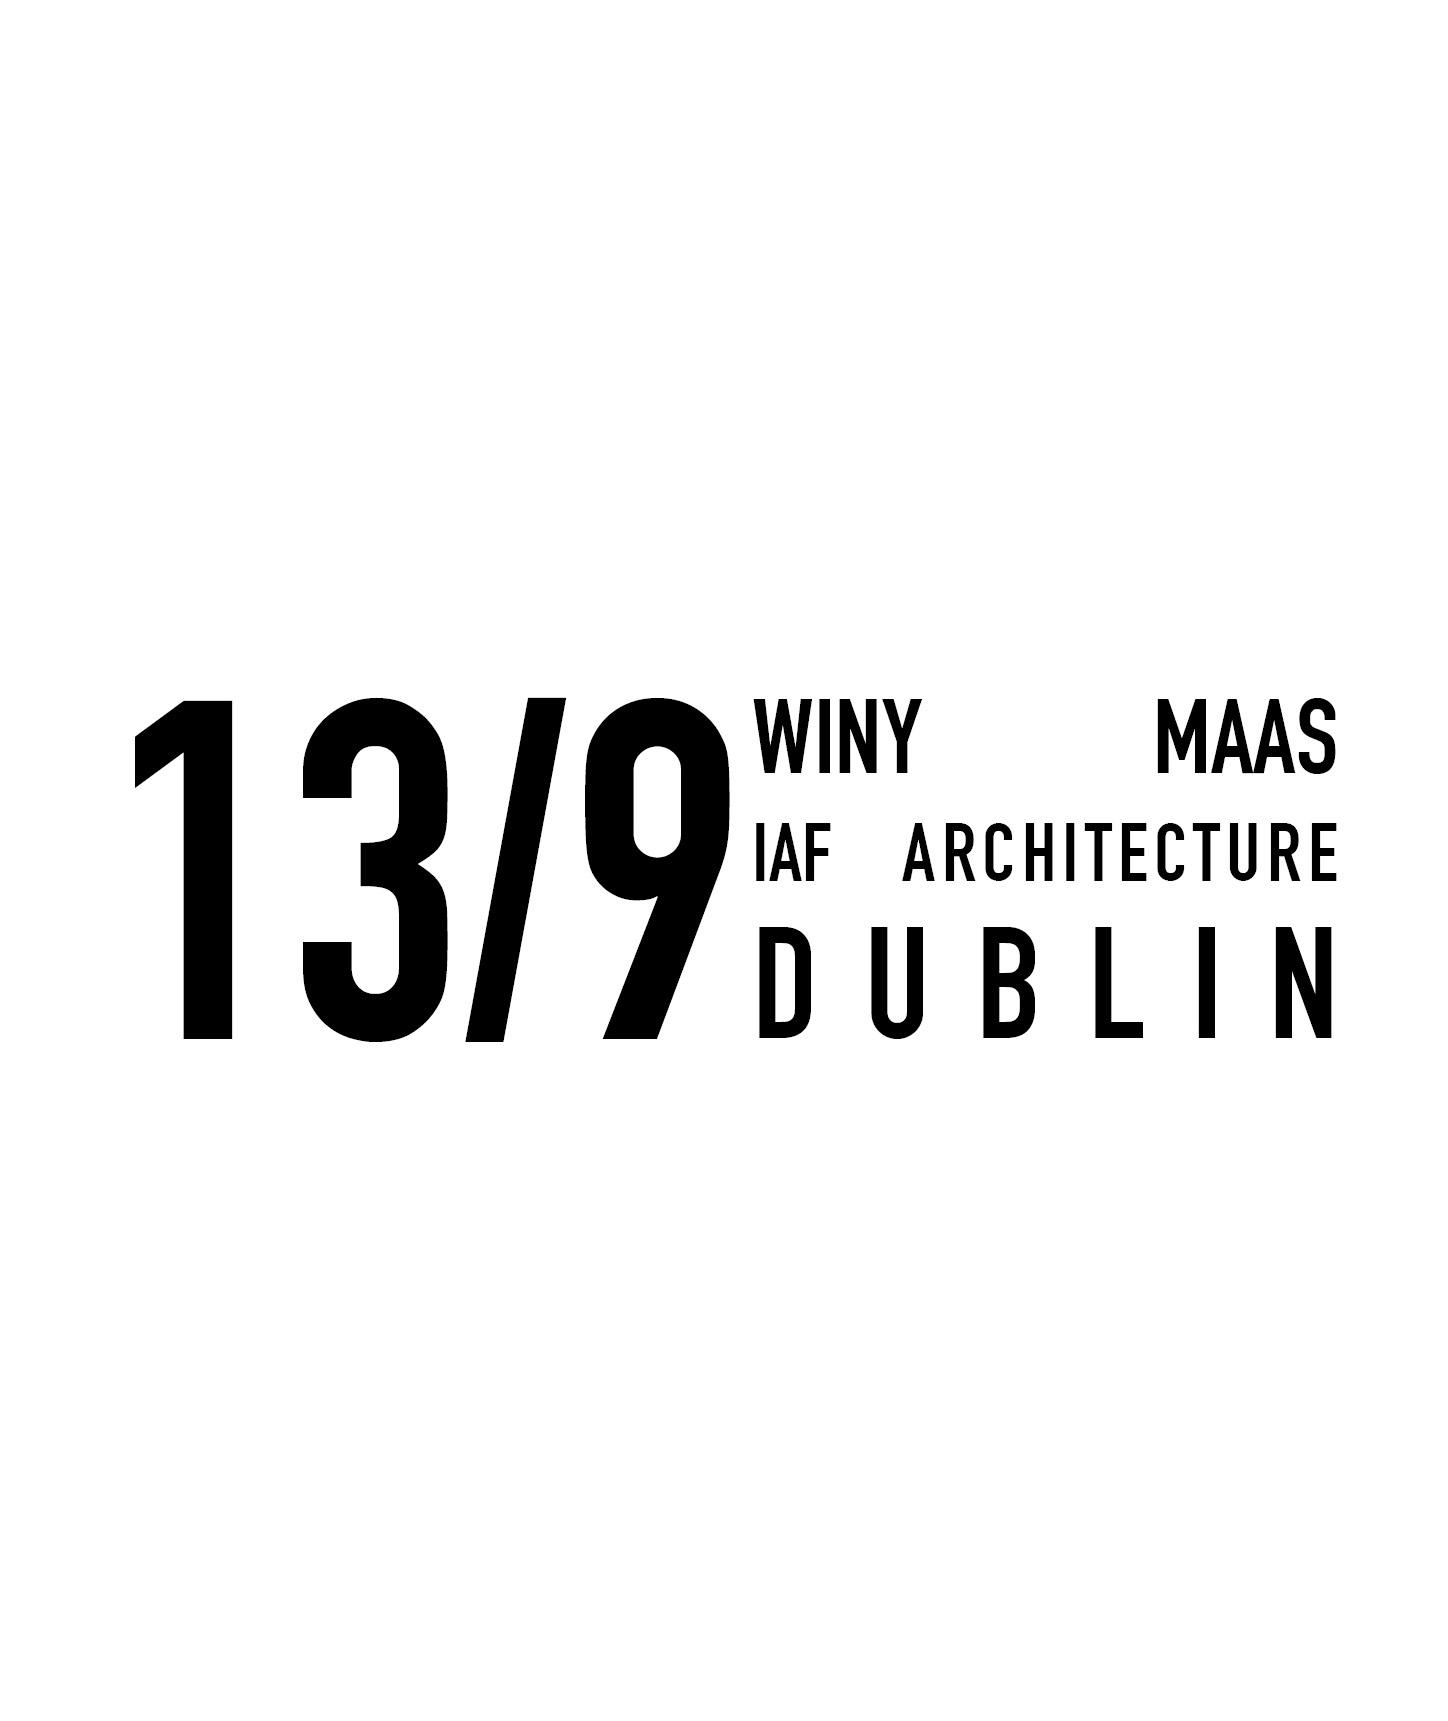 Winy_DUBLIN_crop.jpg